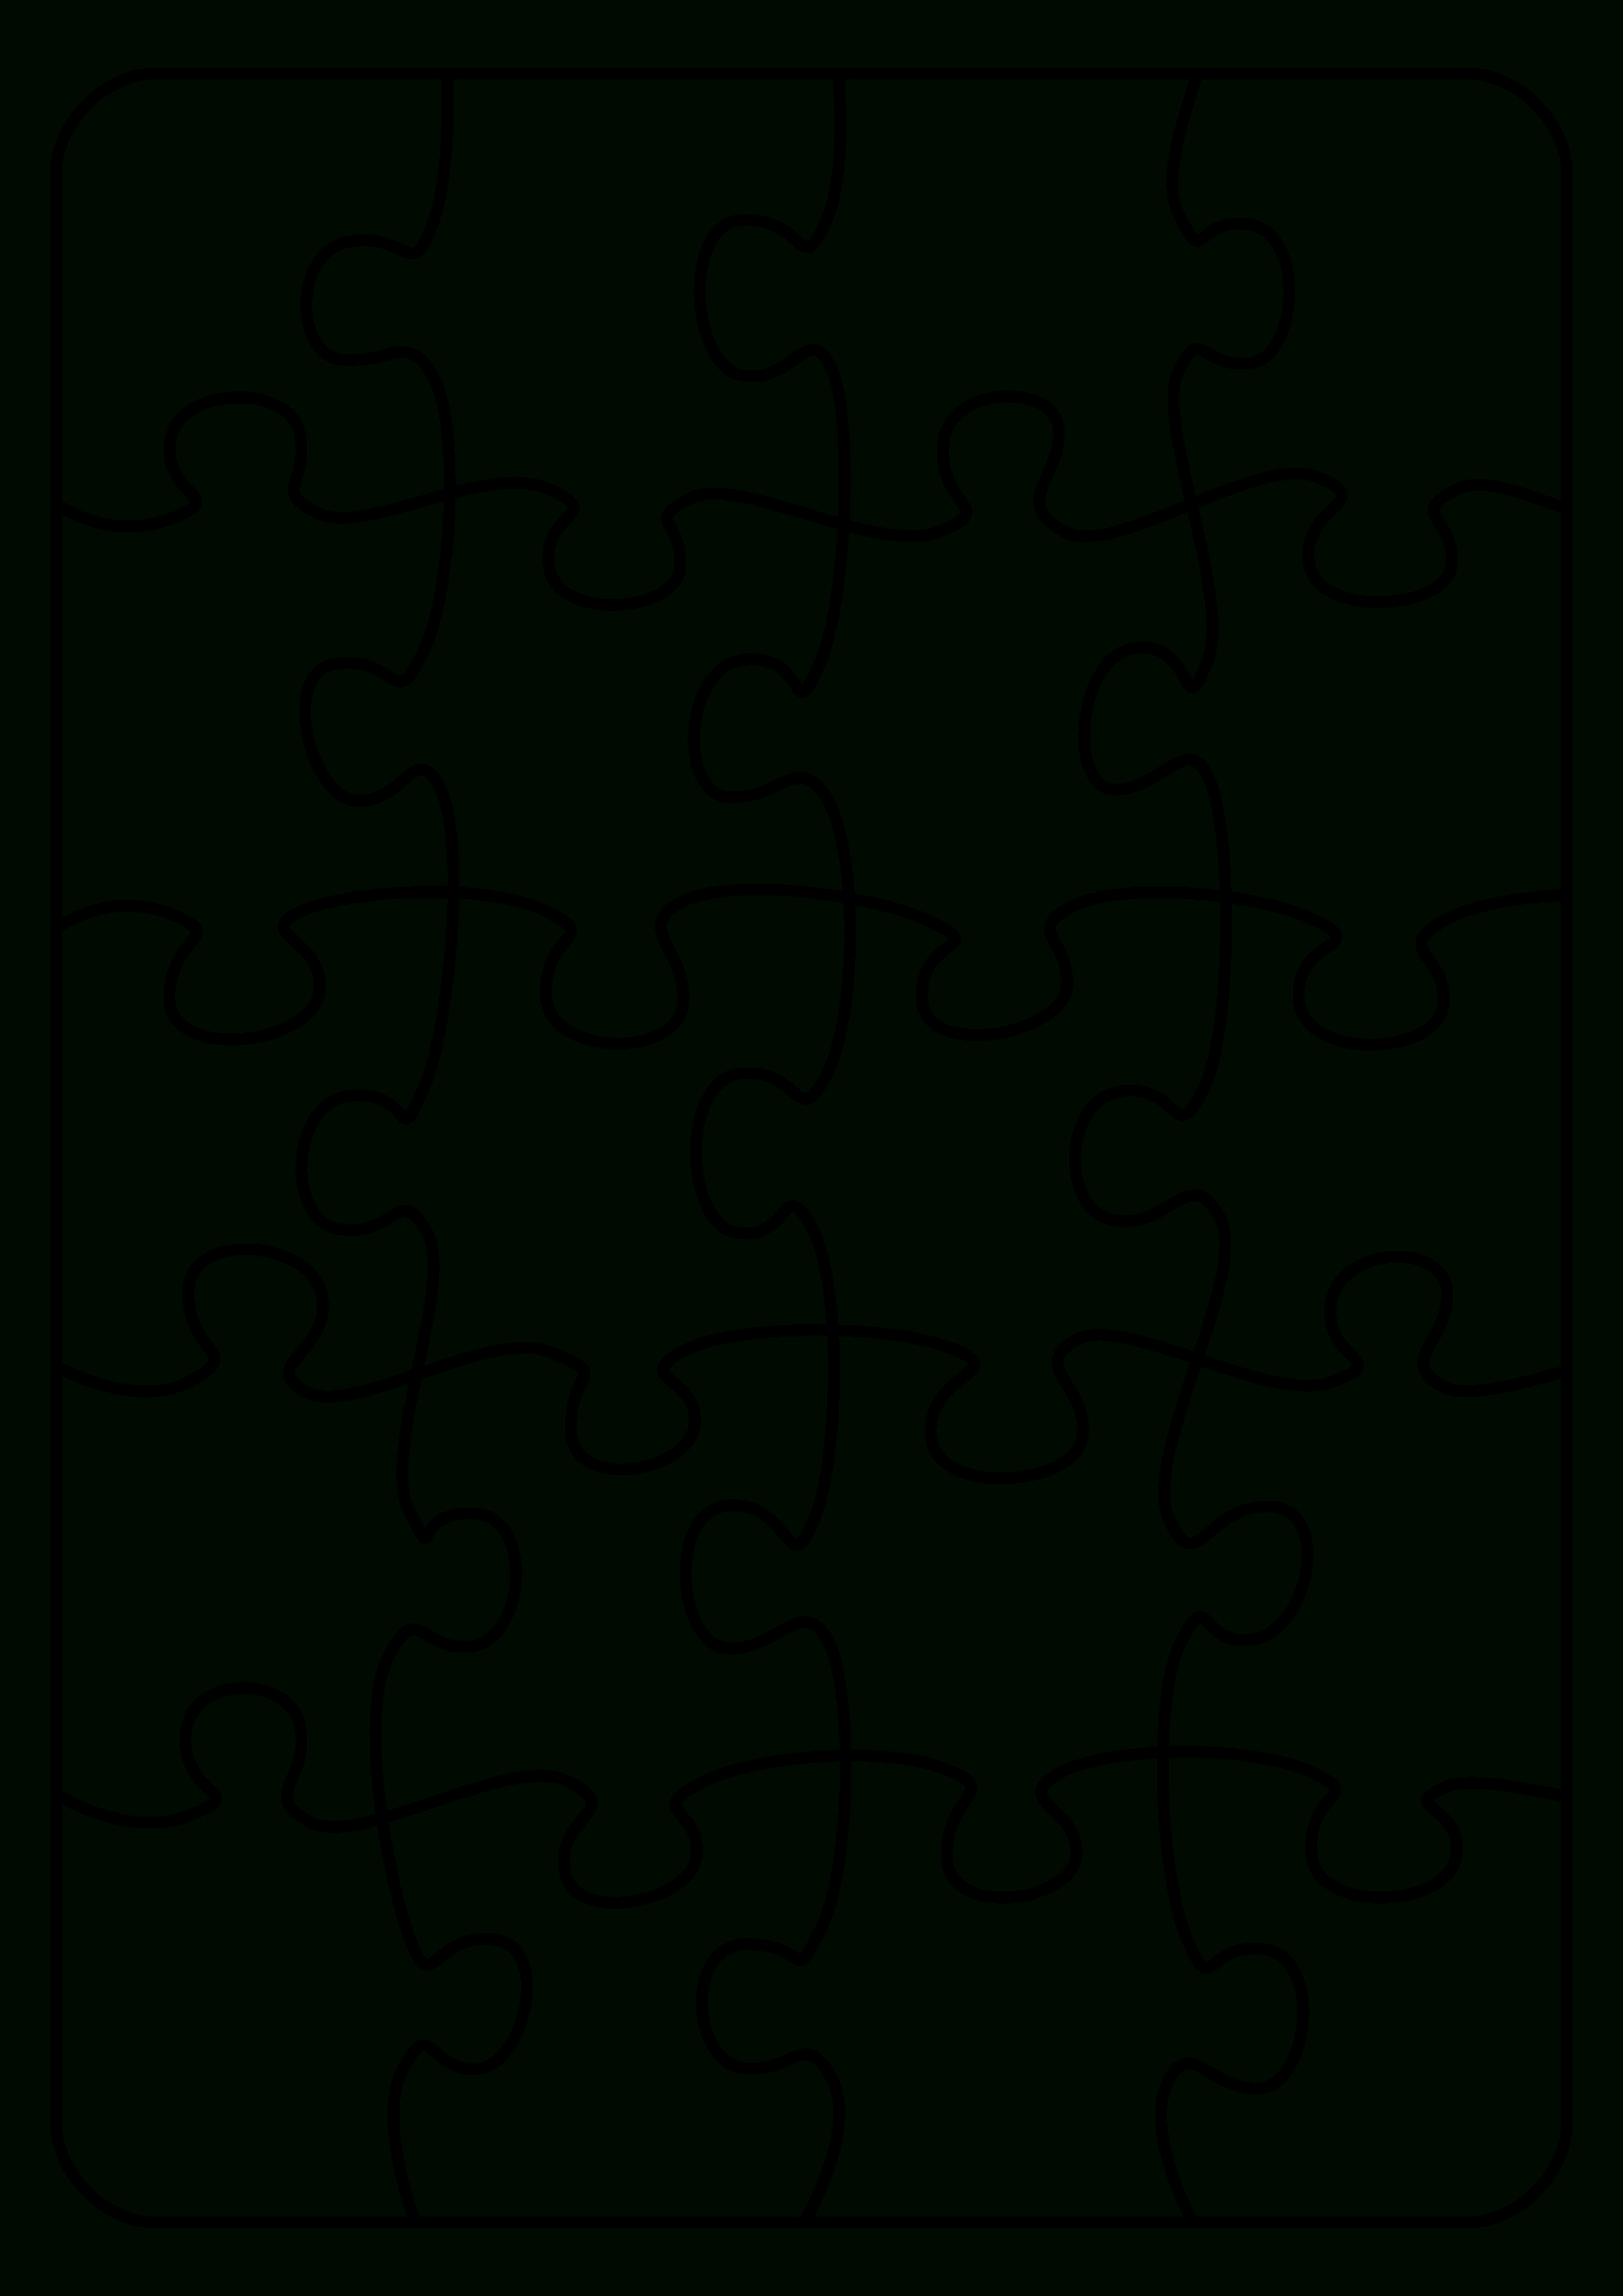 Jigsaw 20 Piecespacefem | New School Year | Puzzle Art, Jigsaw - Printable Jigsaw Puzzles 6 Pieces